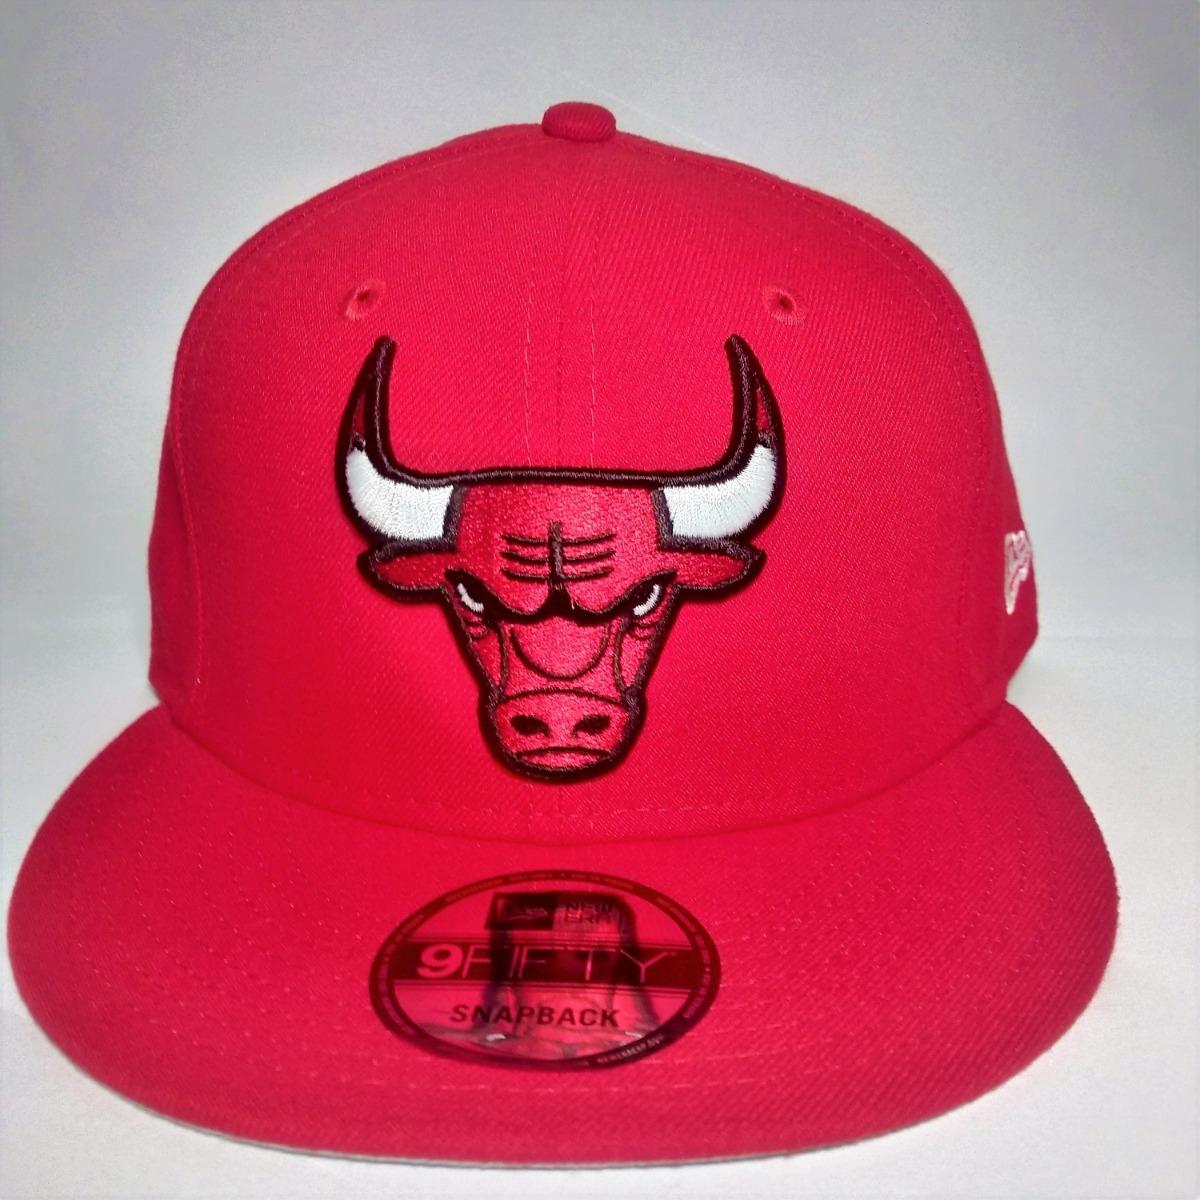 Gorras New Era Chicago Bulls Roja 9fifty Snapback -   94.900 en ... ba11a534a85